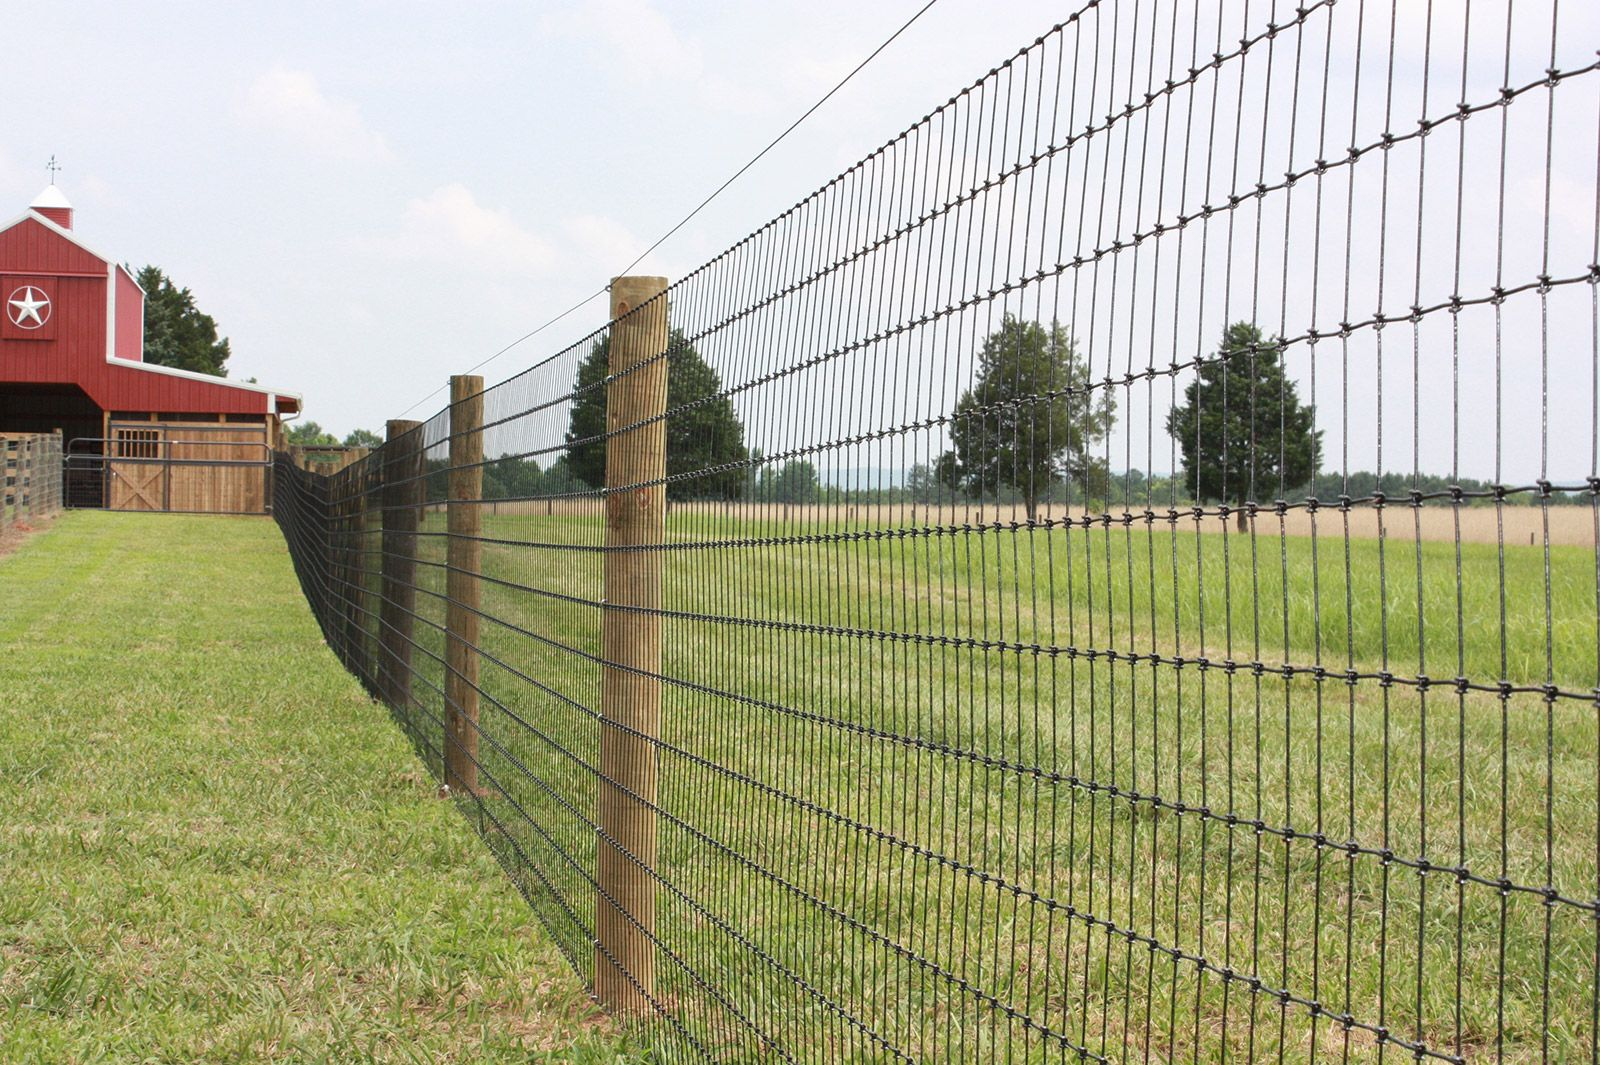 wooden farm fence - Google Search | Outdoor & Garden | Pinterest ...